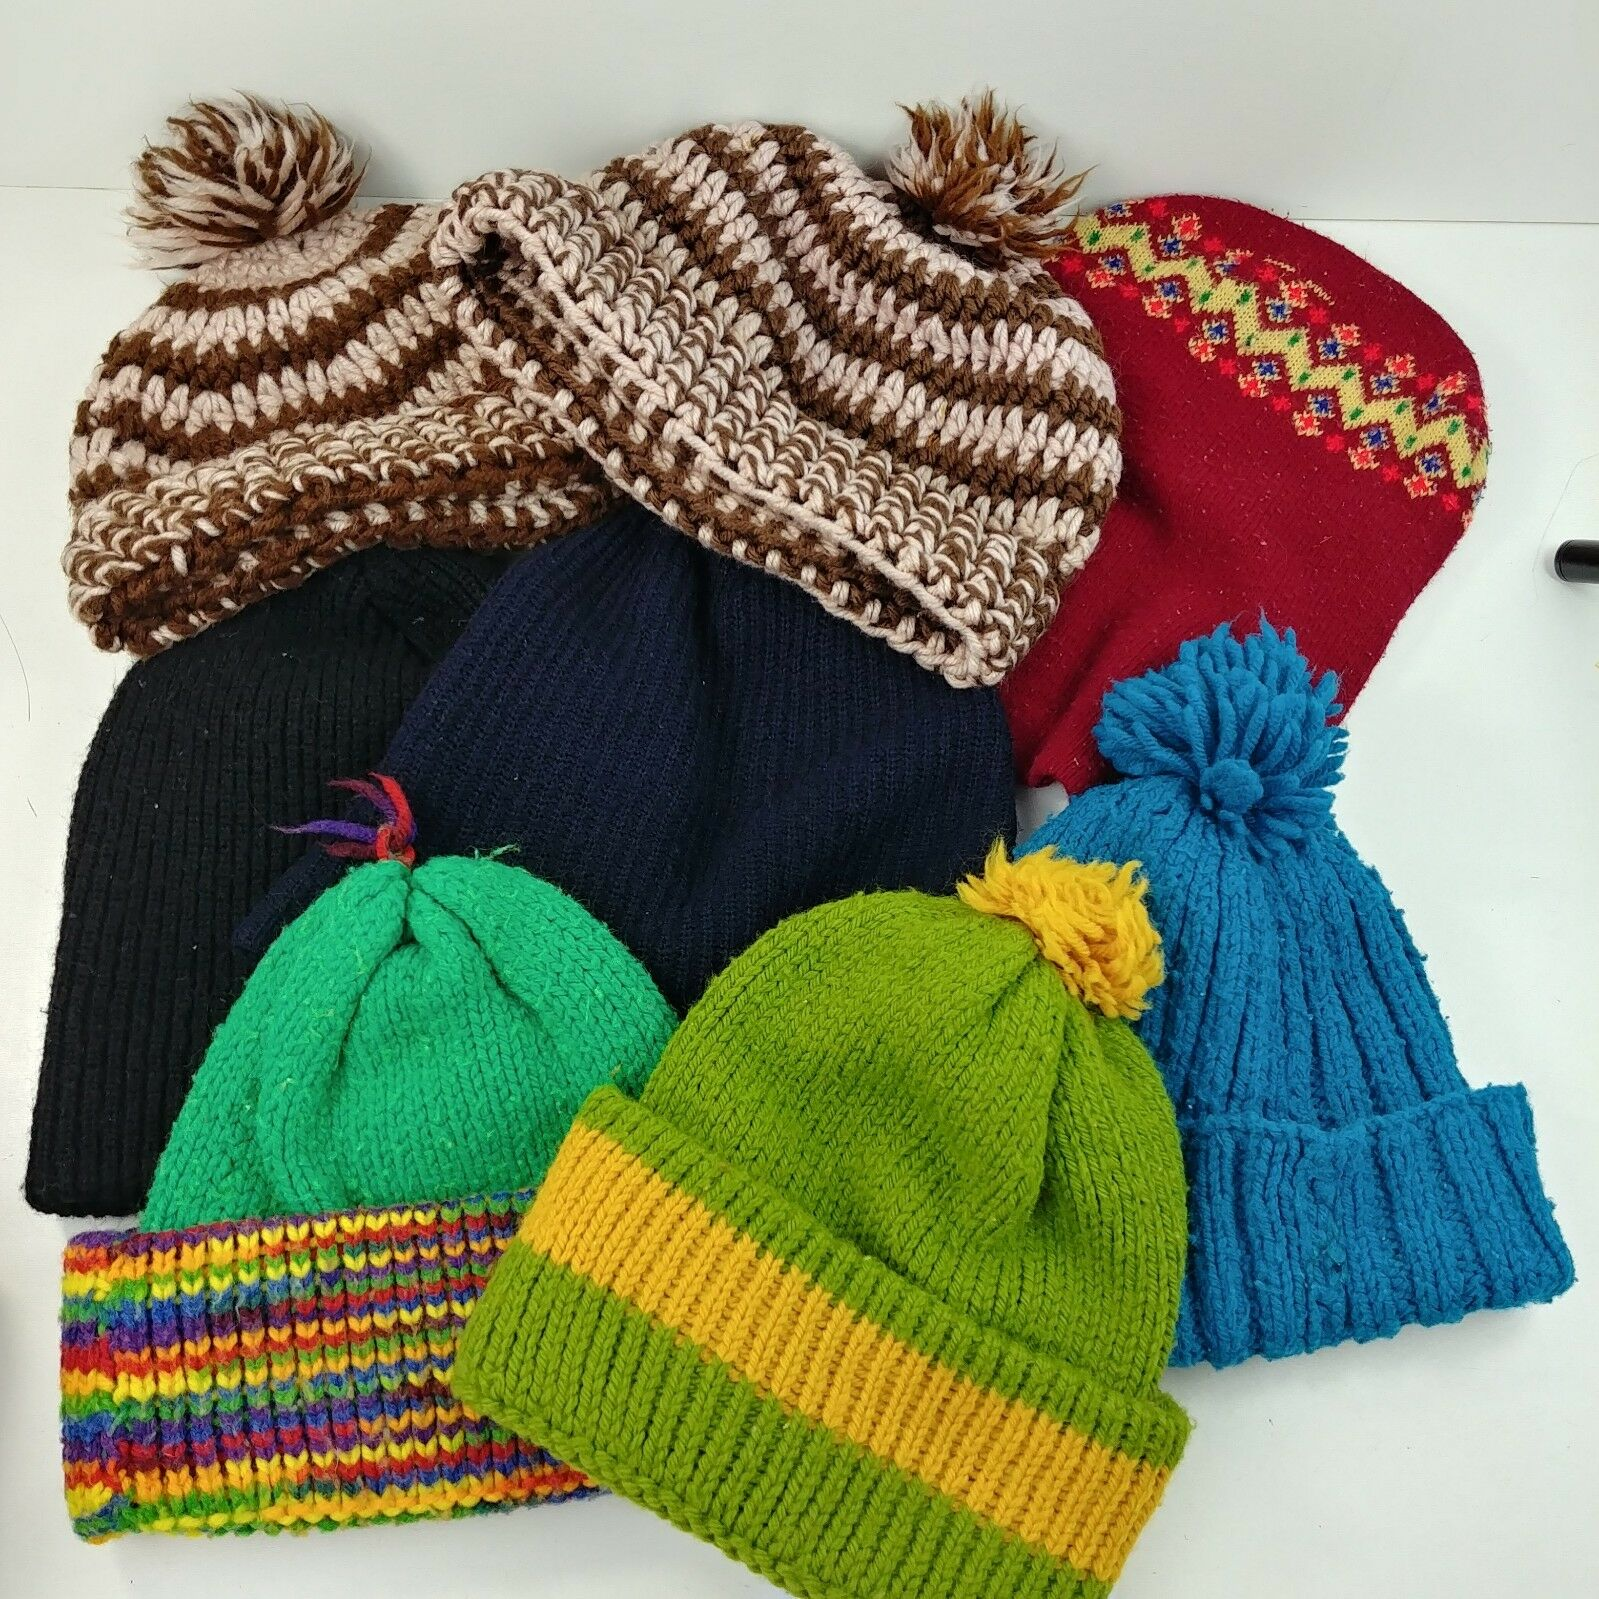 78b0b895 8 Hat Lot – Knit Face Beanie Pom Fuzzy Skull Cap Winter Rainbow